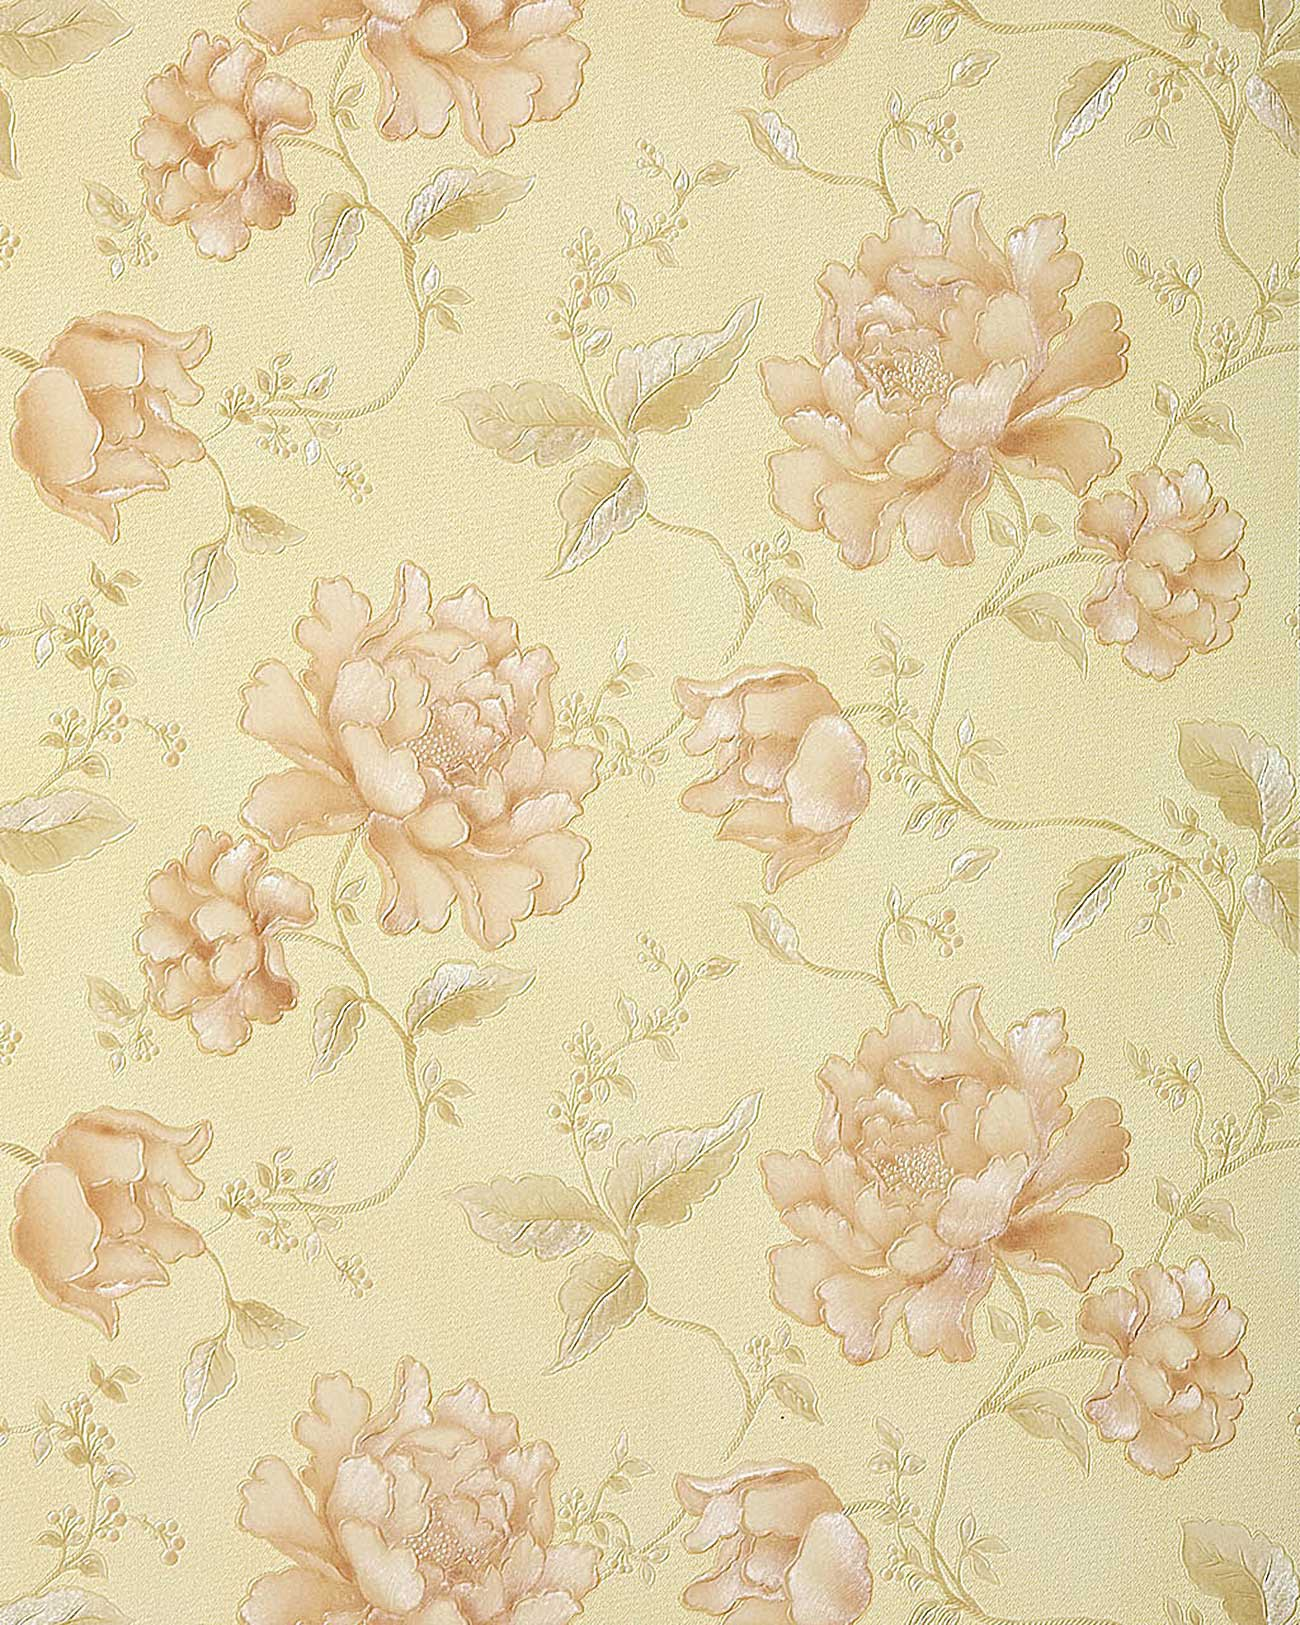 edem 748 31 3d luxus floral tapete beige elfenbein platin gold hell rosa blumen original edem. Black Bedroom Furniture Sets. Home Design Ideas